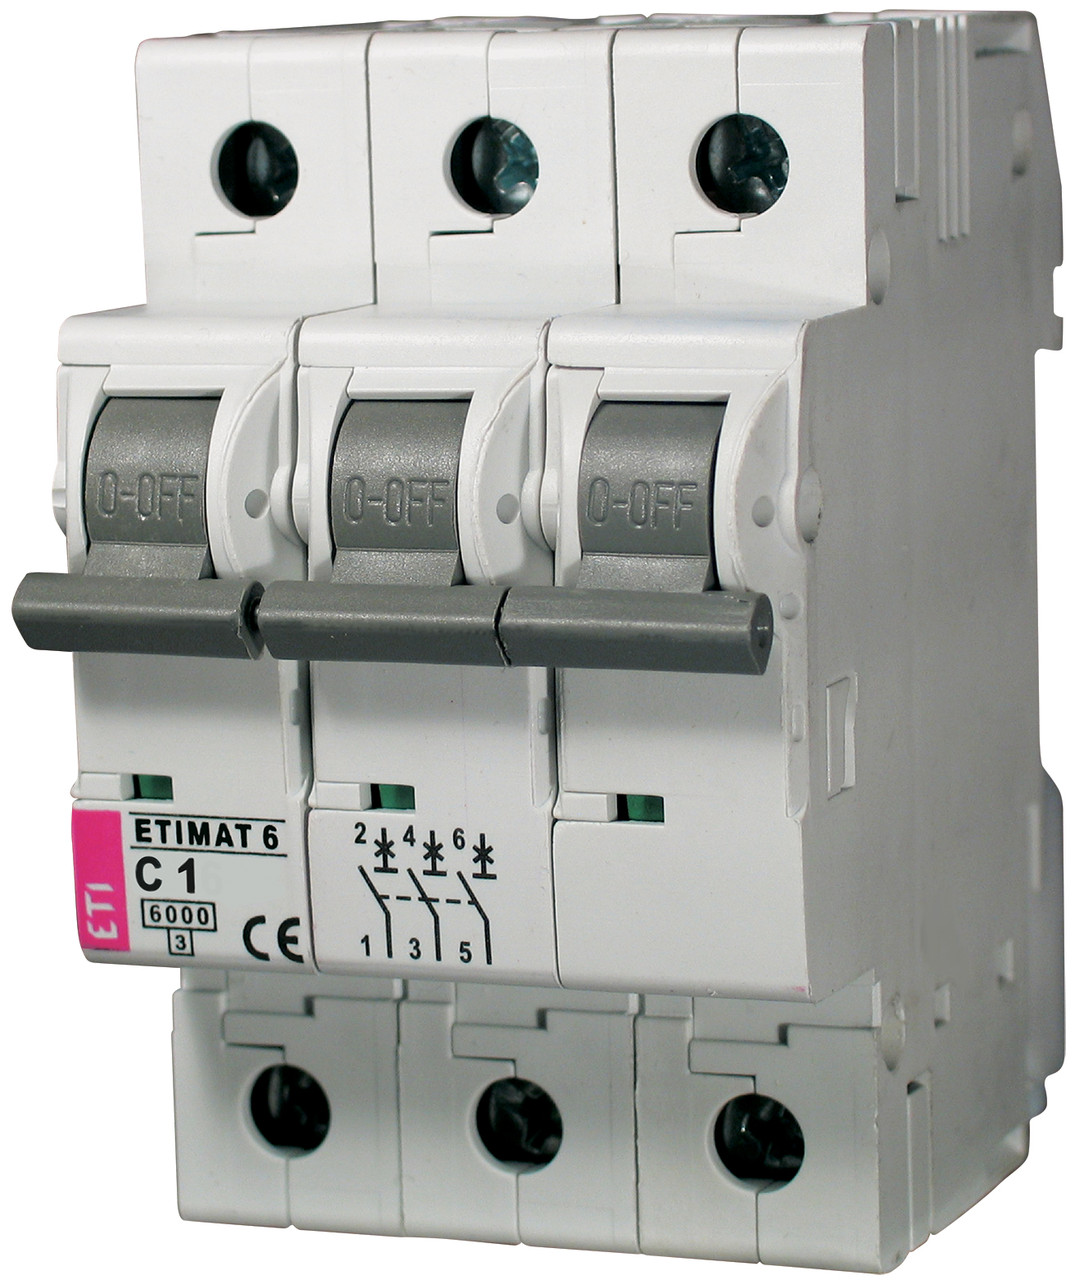 Авт. вимикач ETIMAT 6 3p C 1 A (6kA), ETI, 2145504